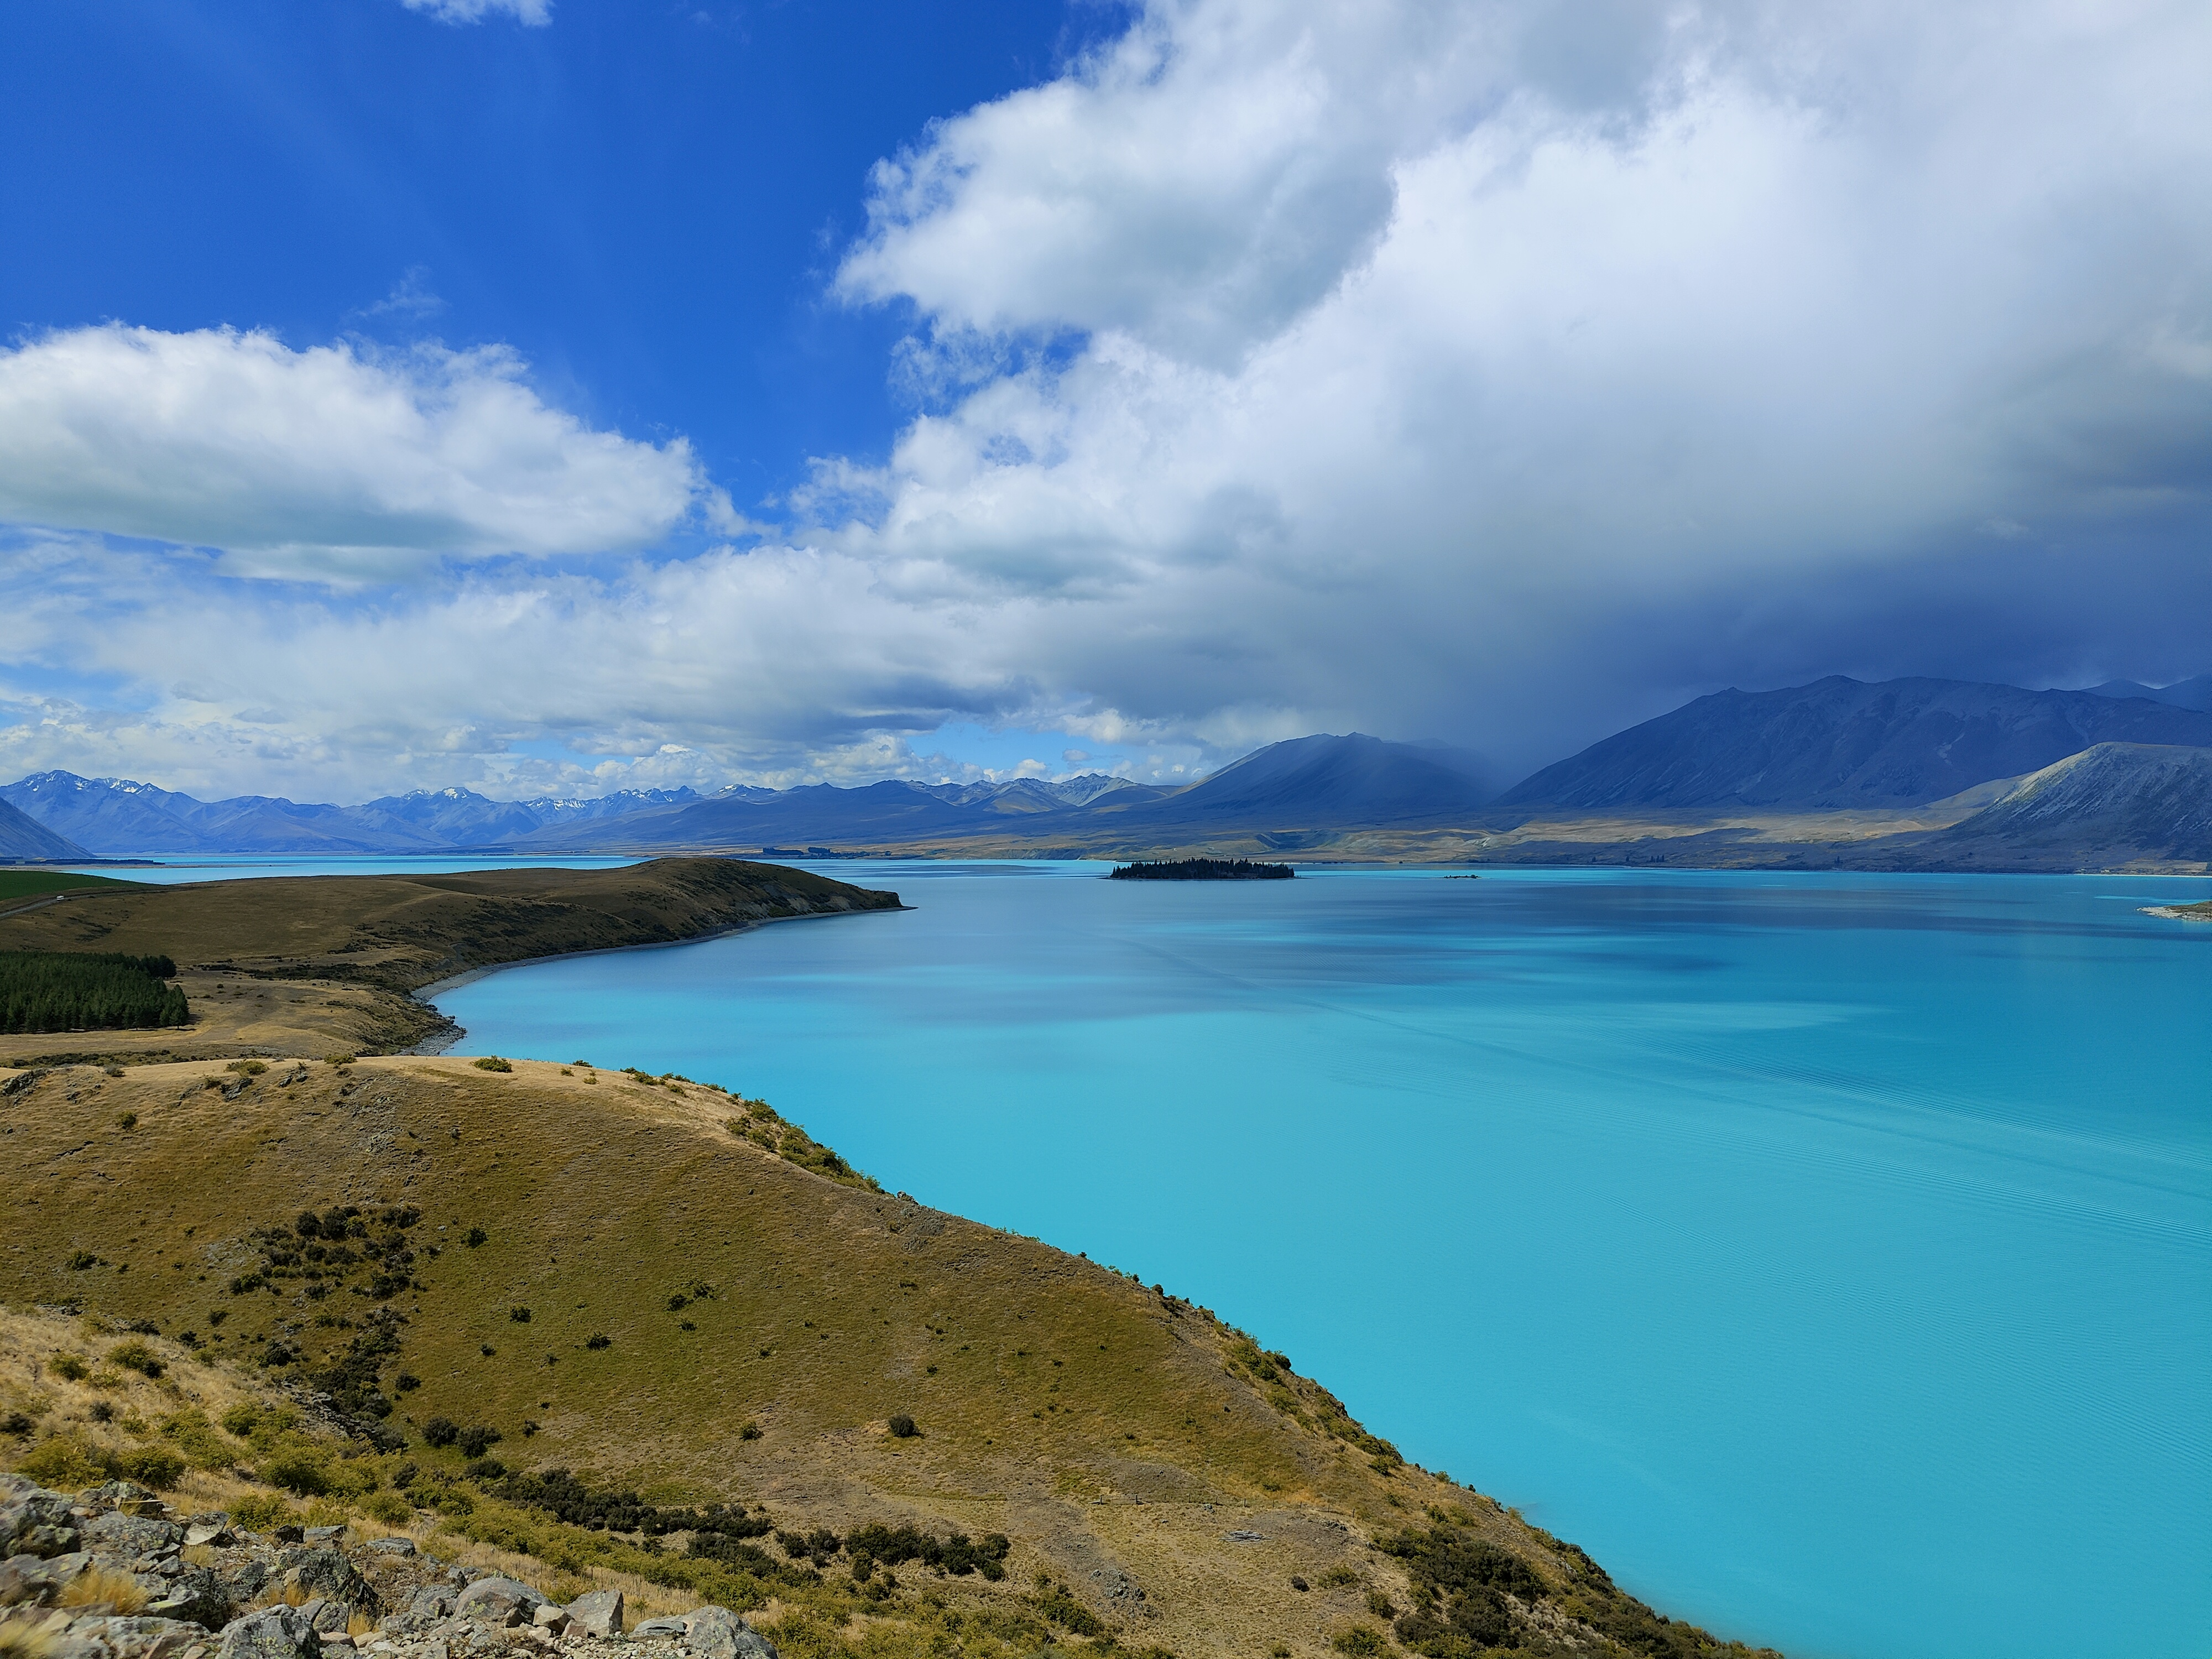 Lake Tekapo from the Mt John walkway